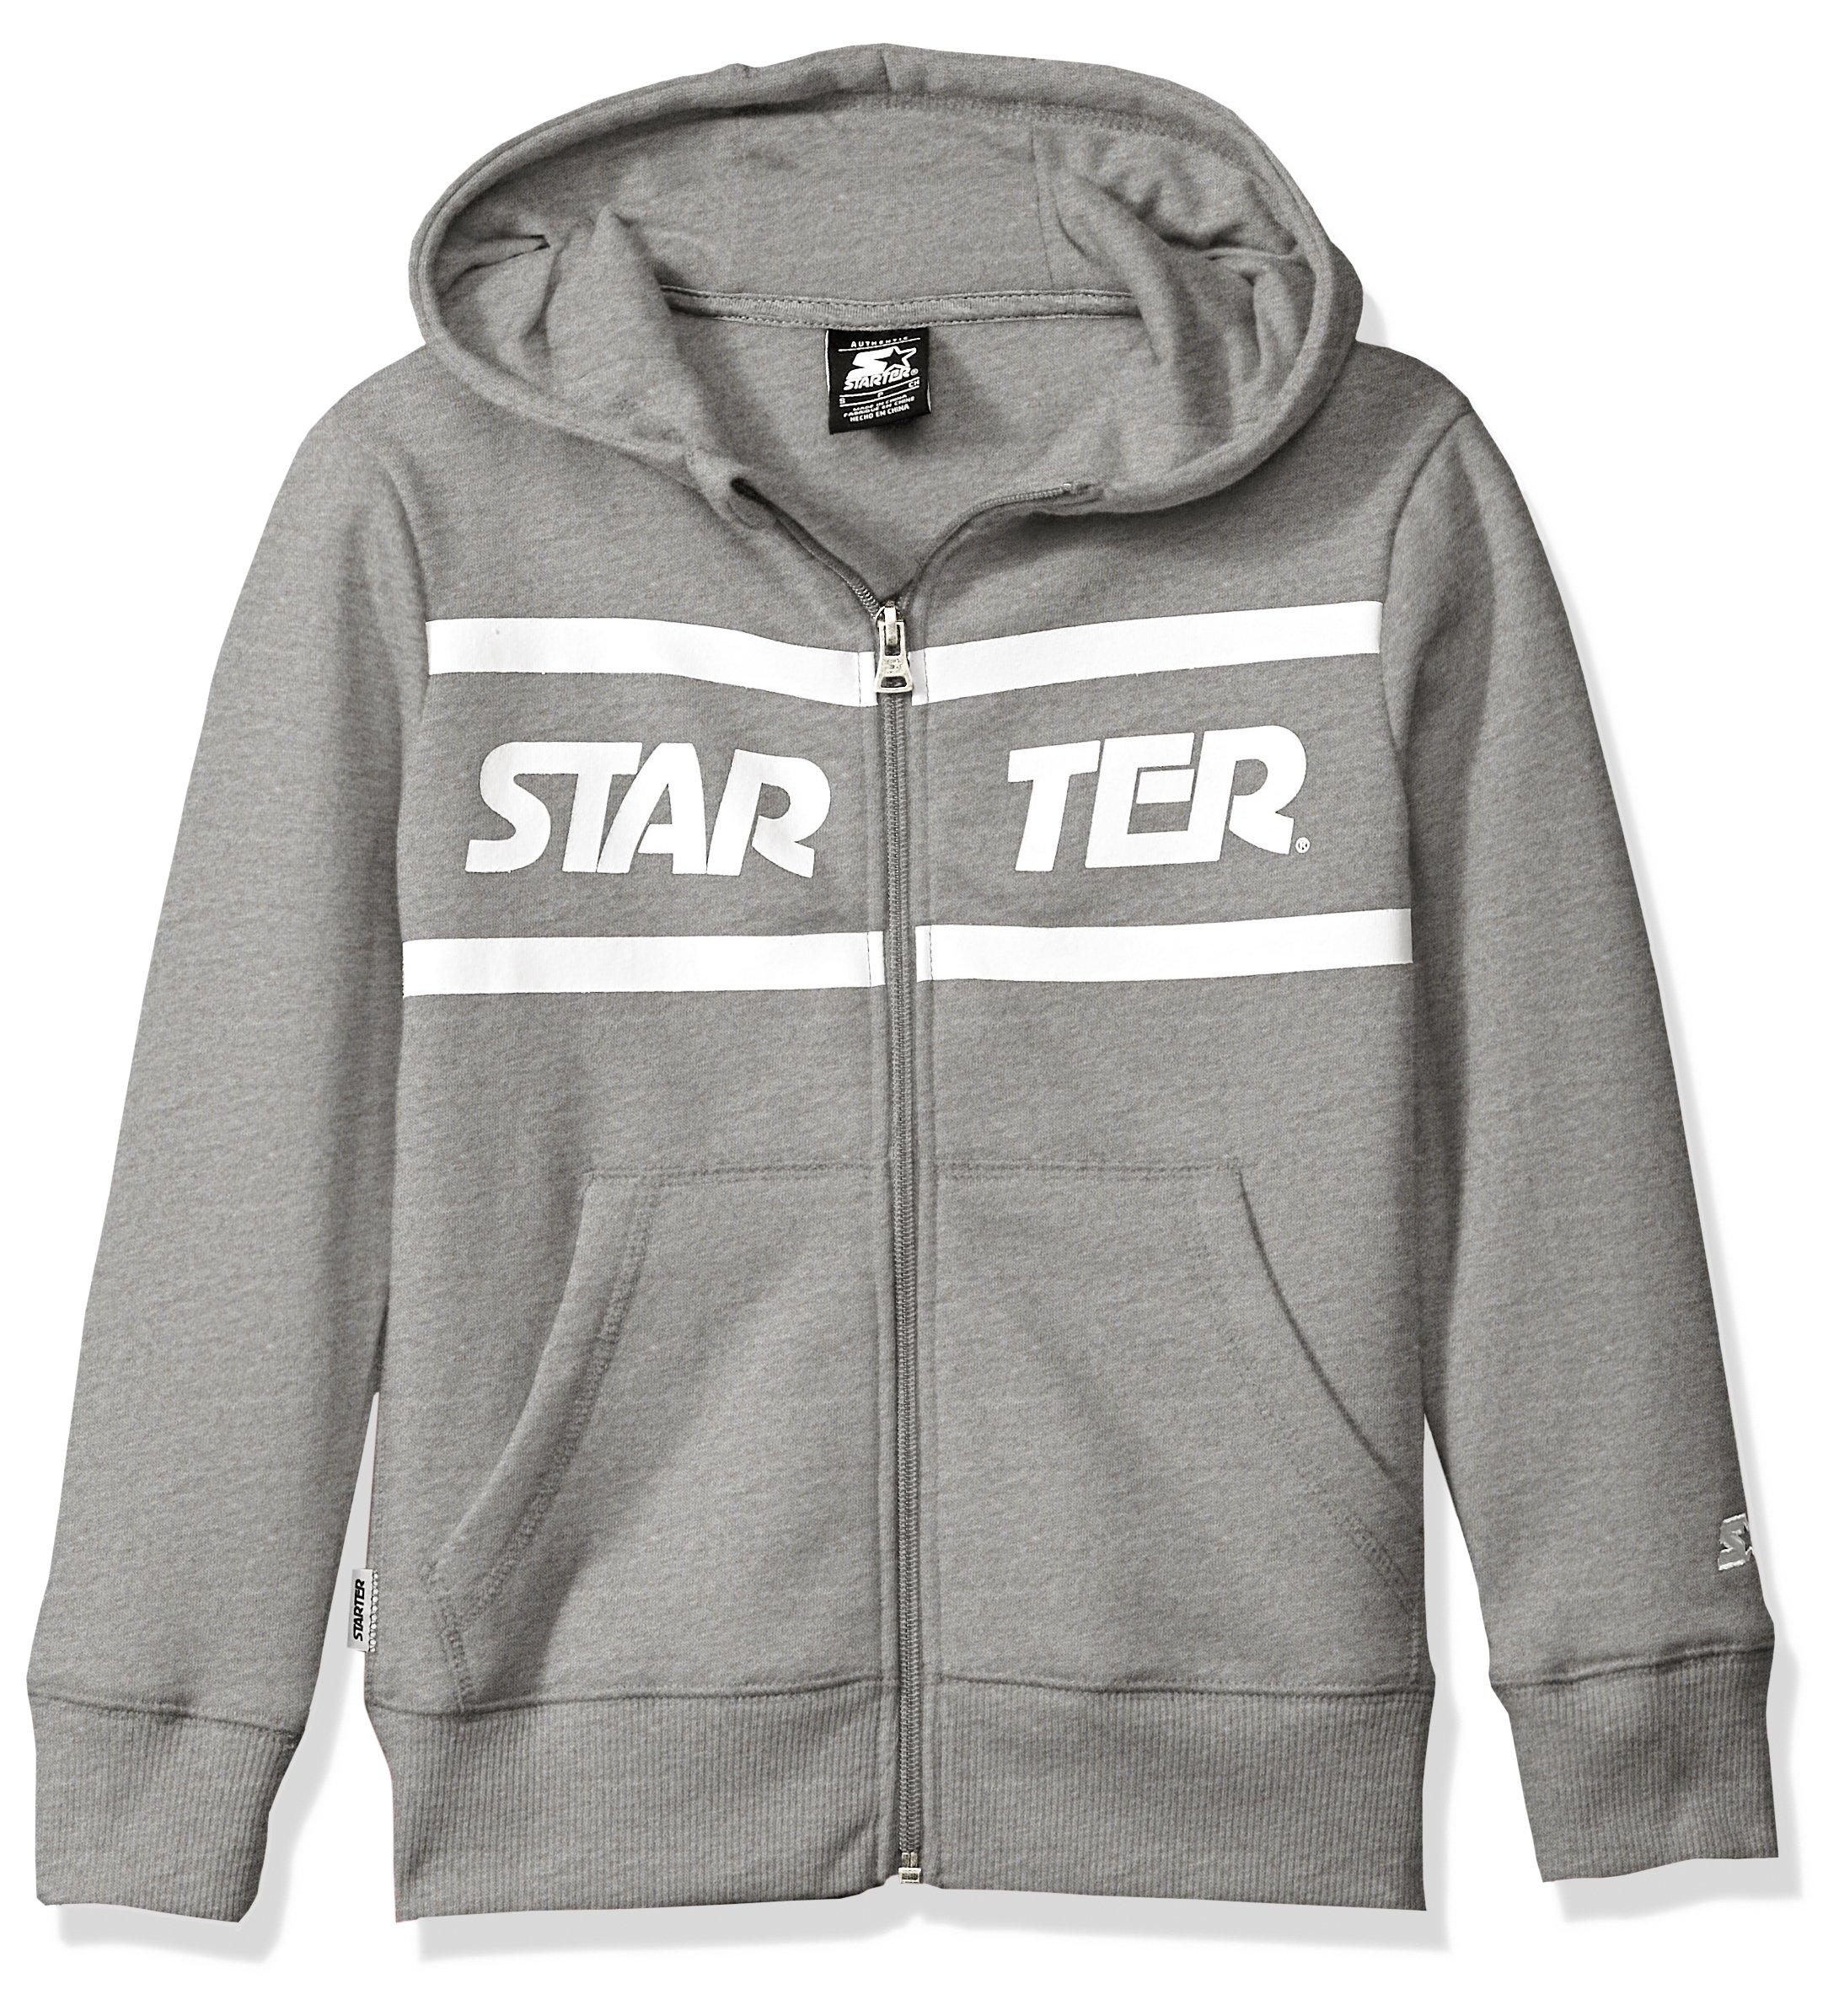 Starter Girls' Zip-up Logo Hoodie, Prime Exclusive, Vapor Grey Heather with Solid Rib, L (10/12)